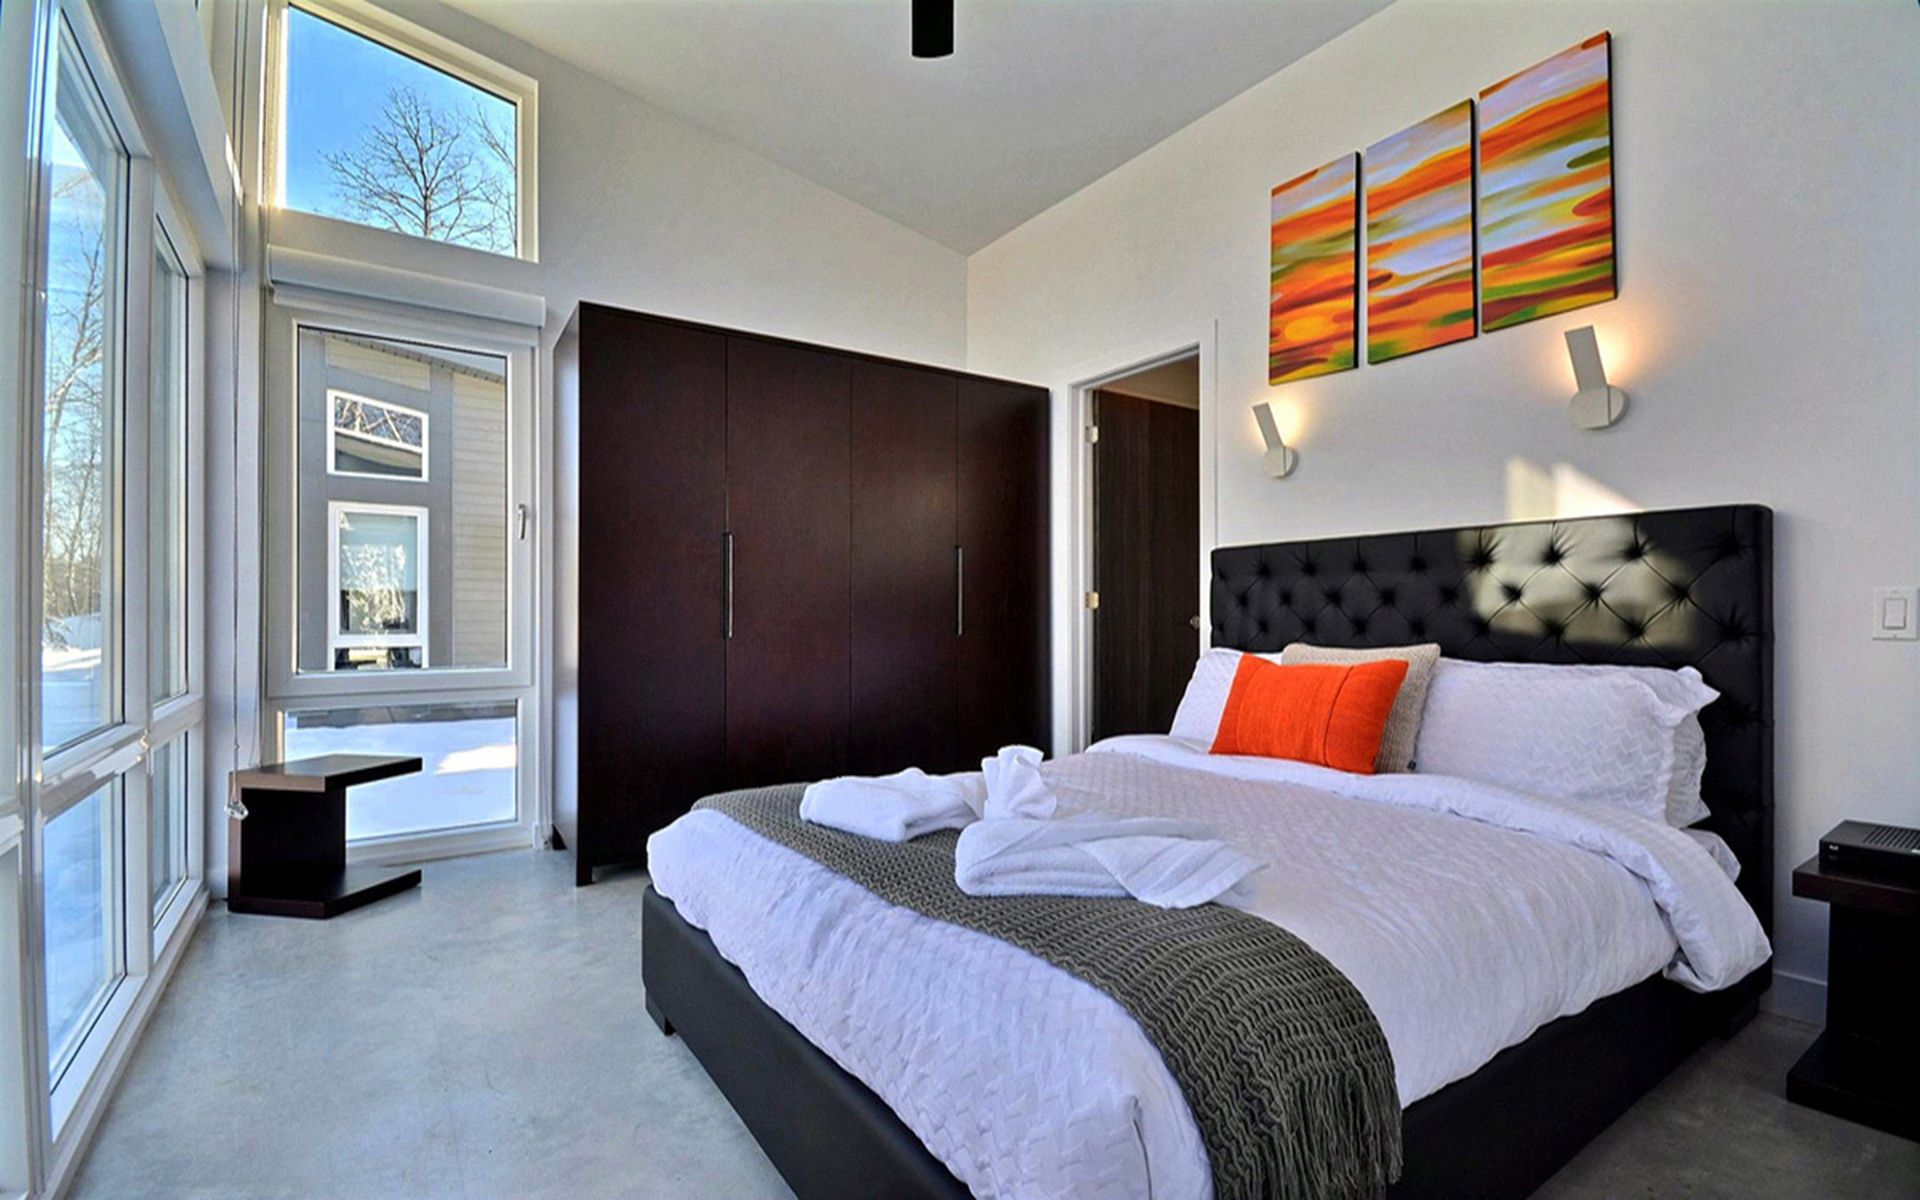 hotel in Tremblant, miniloft rentals